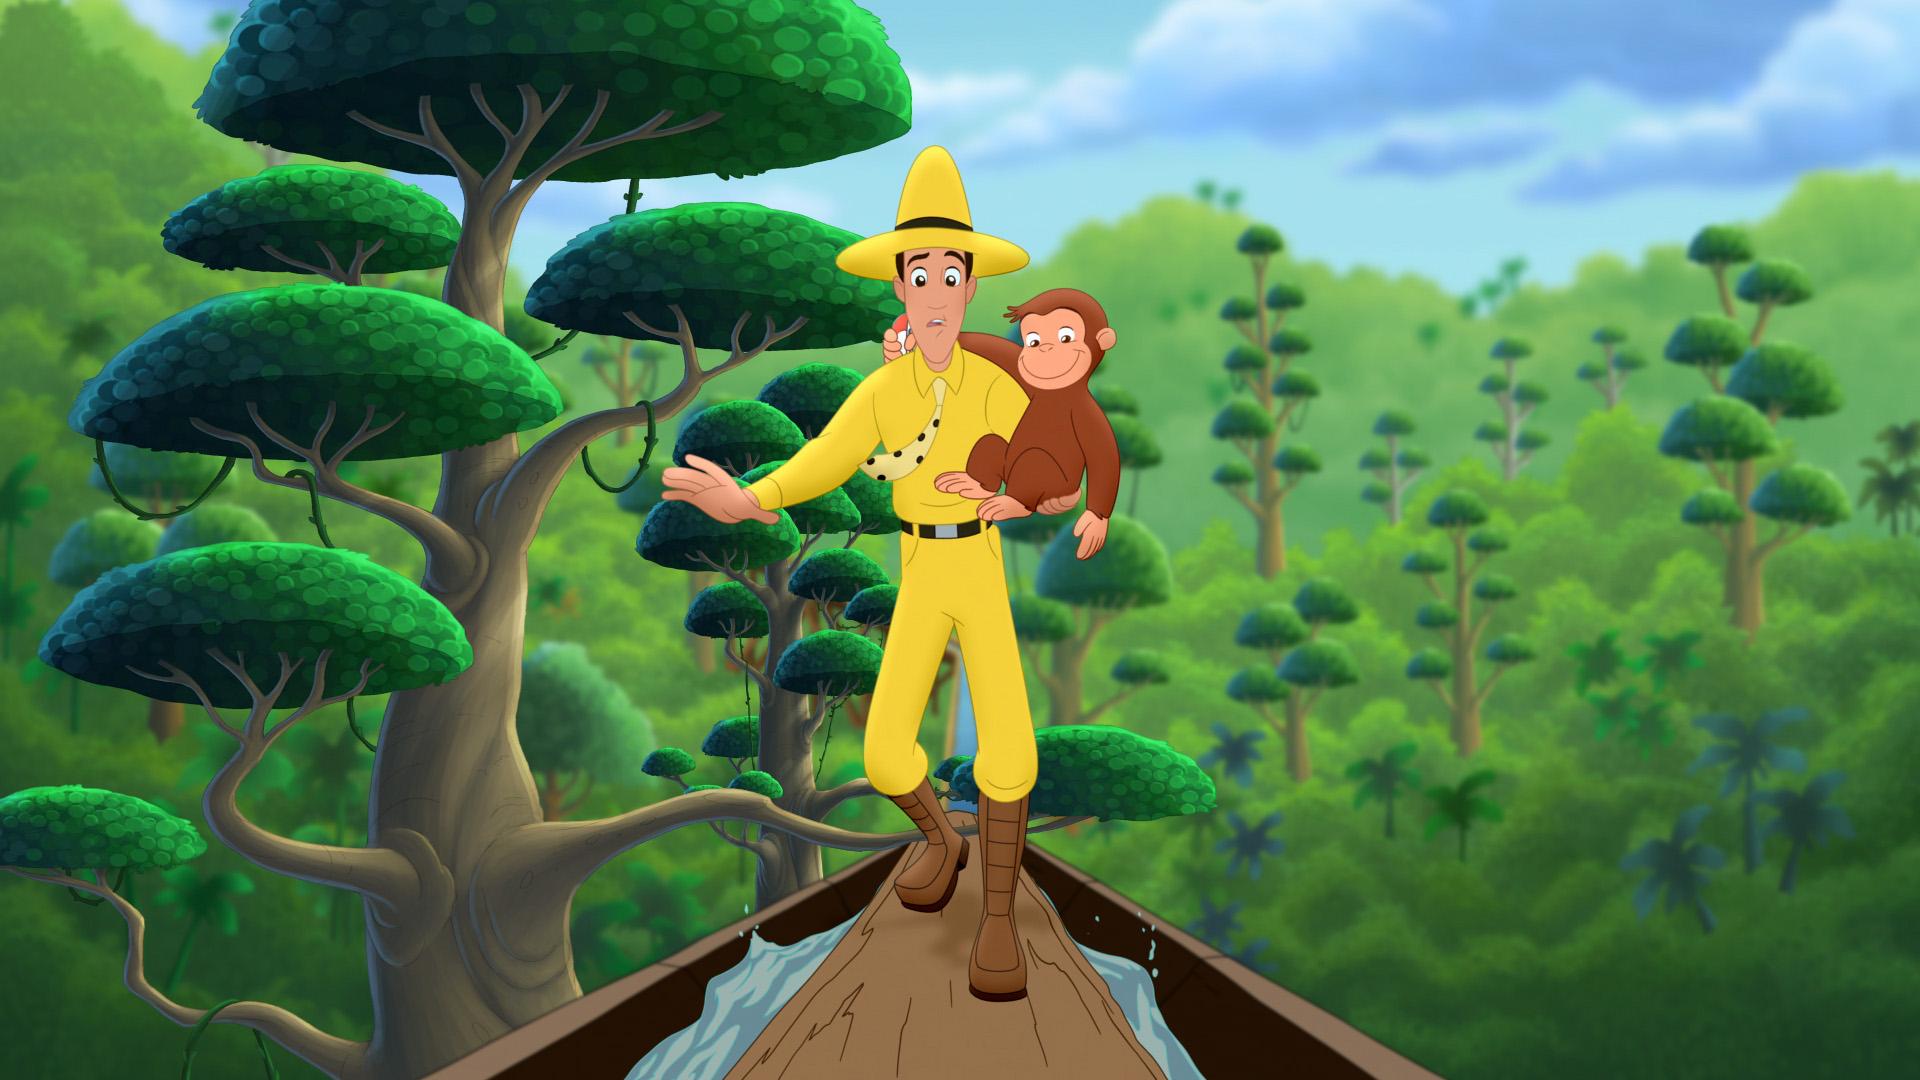 Jungle Animal Wallpaper Curious George 3 Back To The Jungle Dvd Zavvi Com